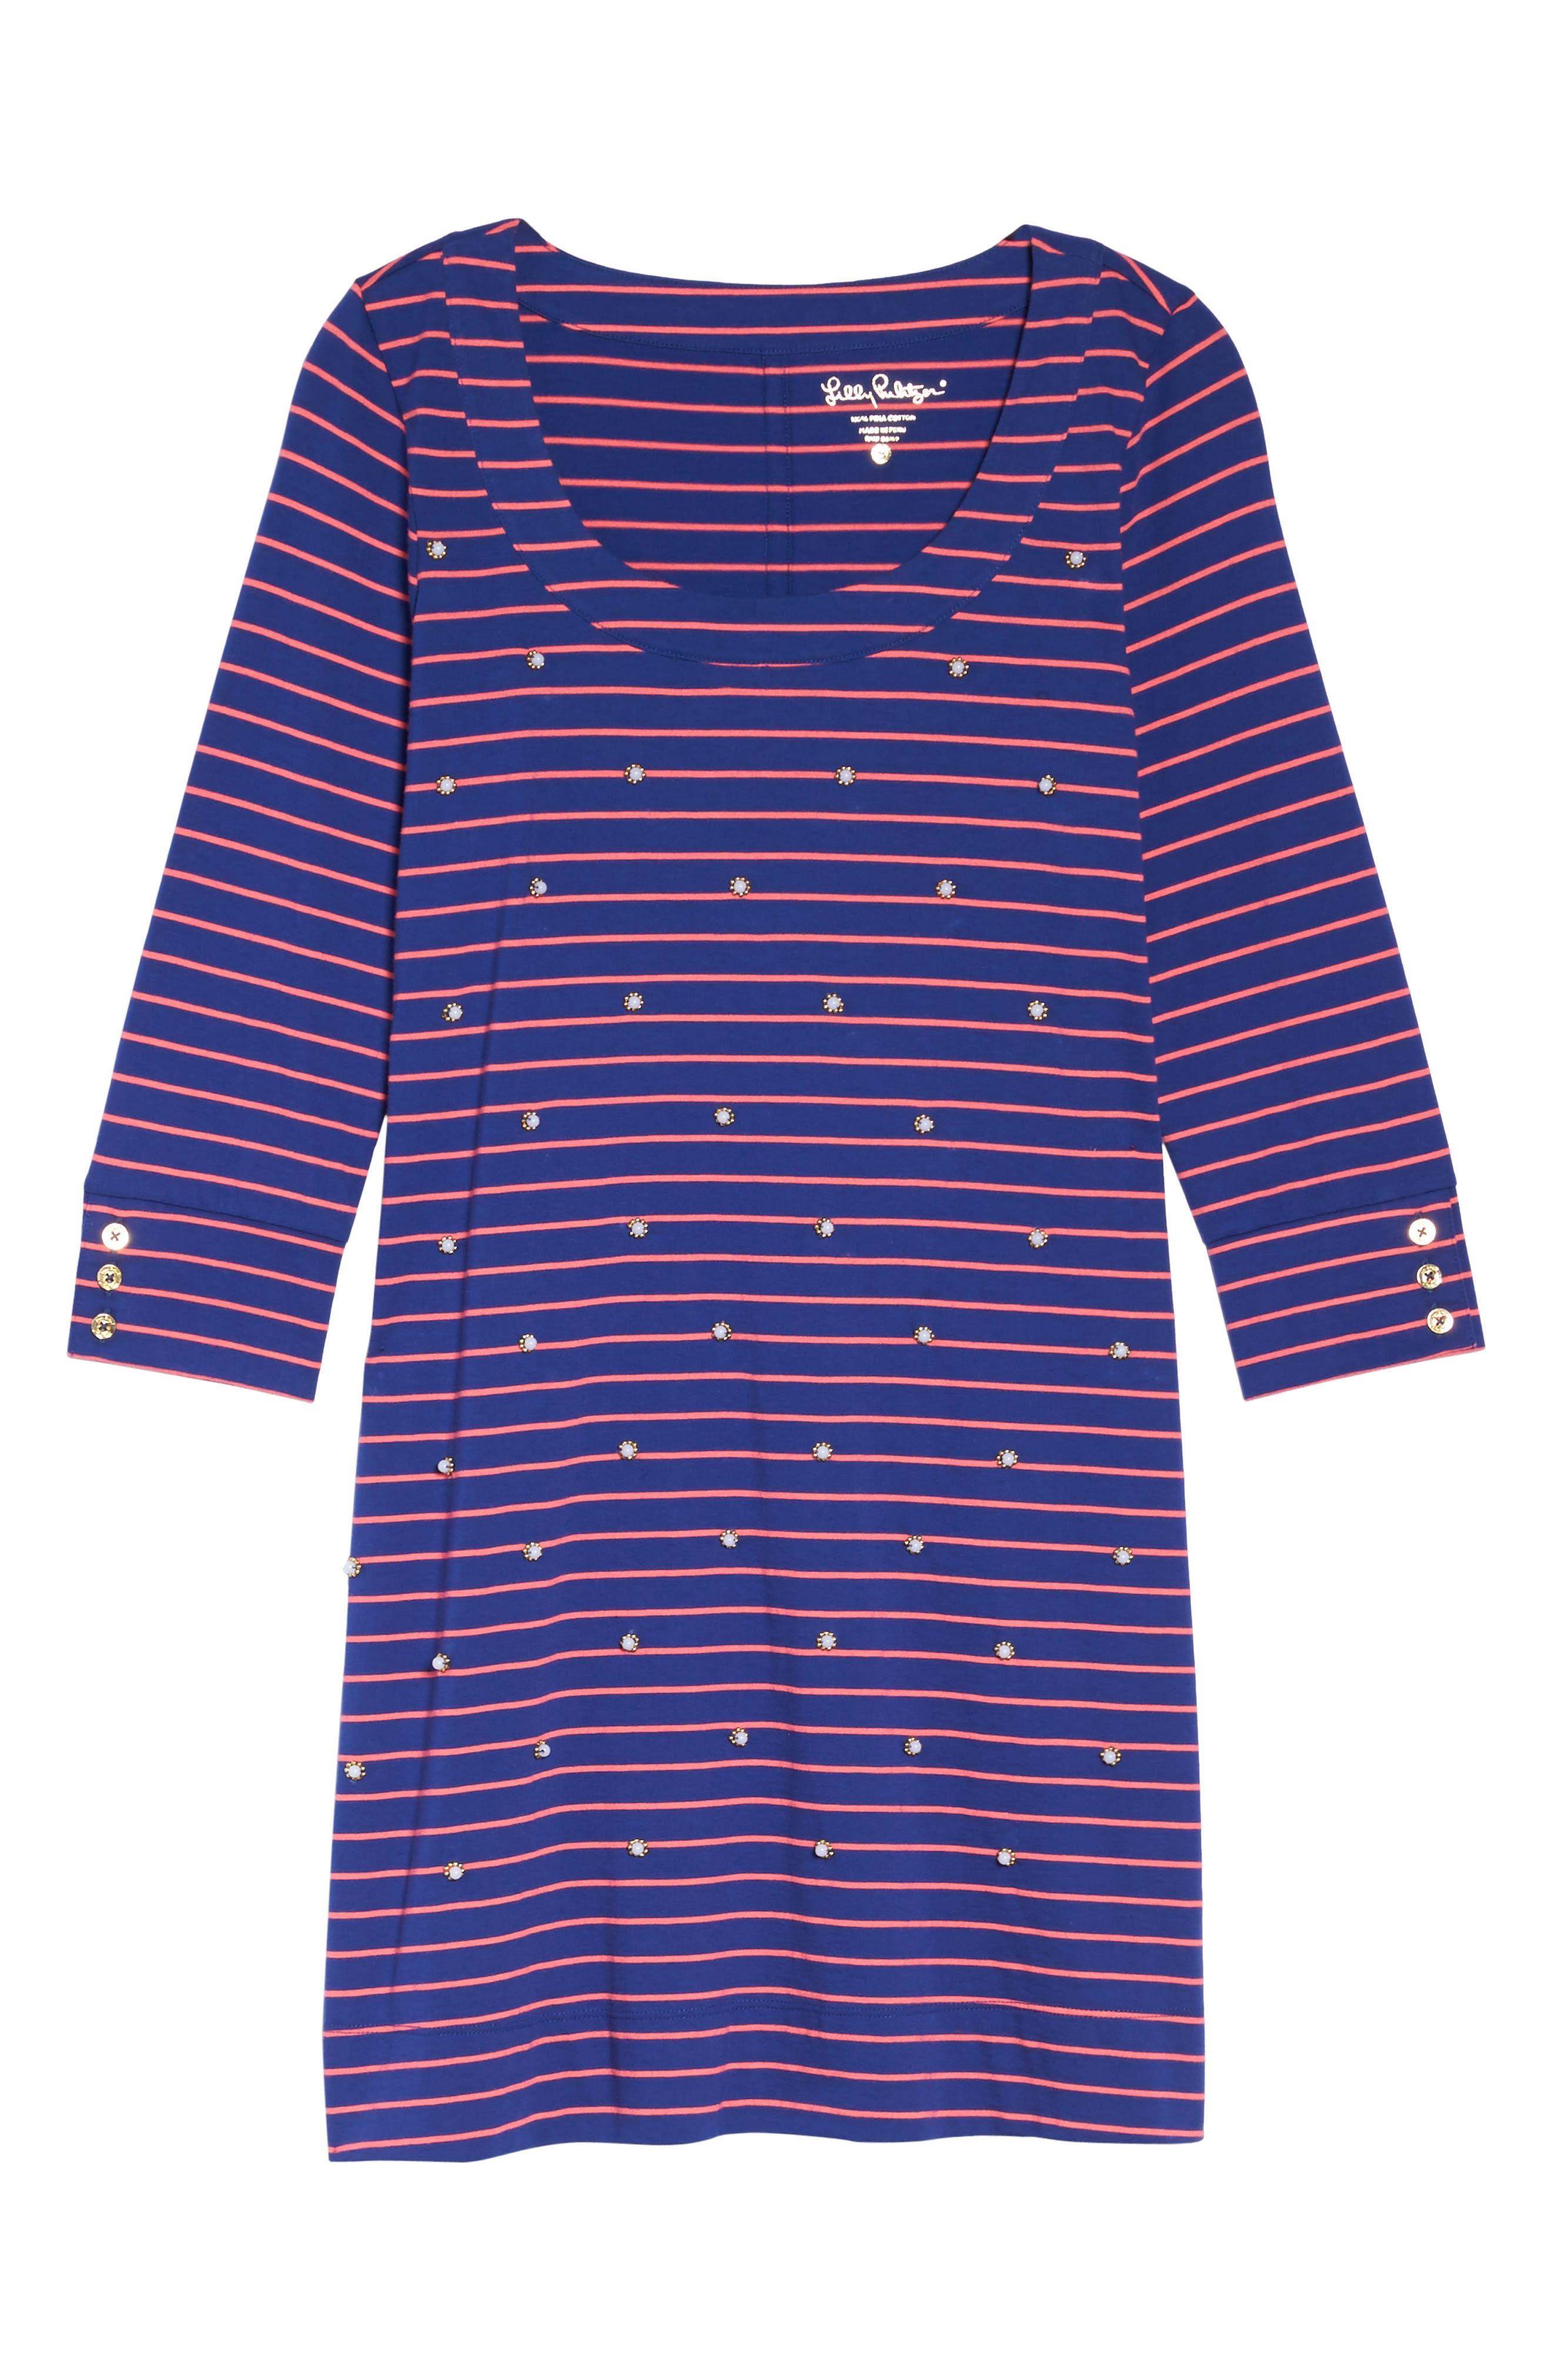 Merrit Beaded T-Shirt Dress,                             Alternate thumbnail 6, color,